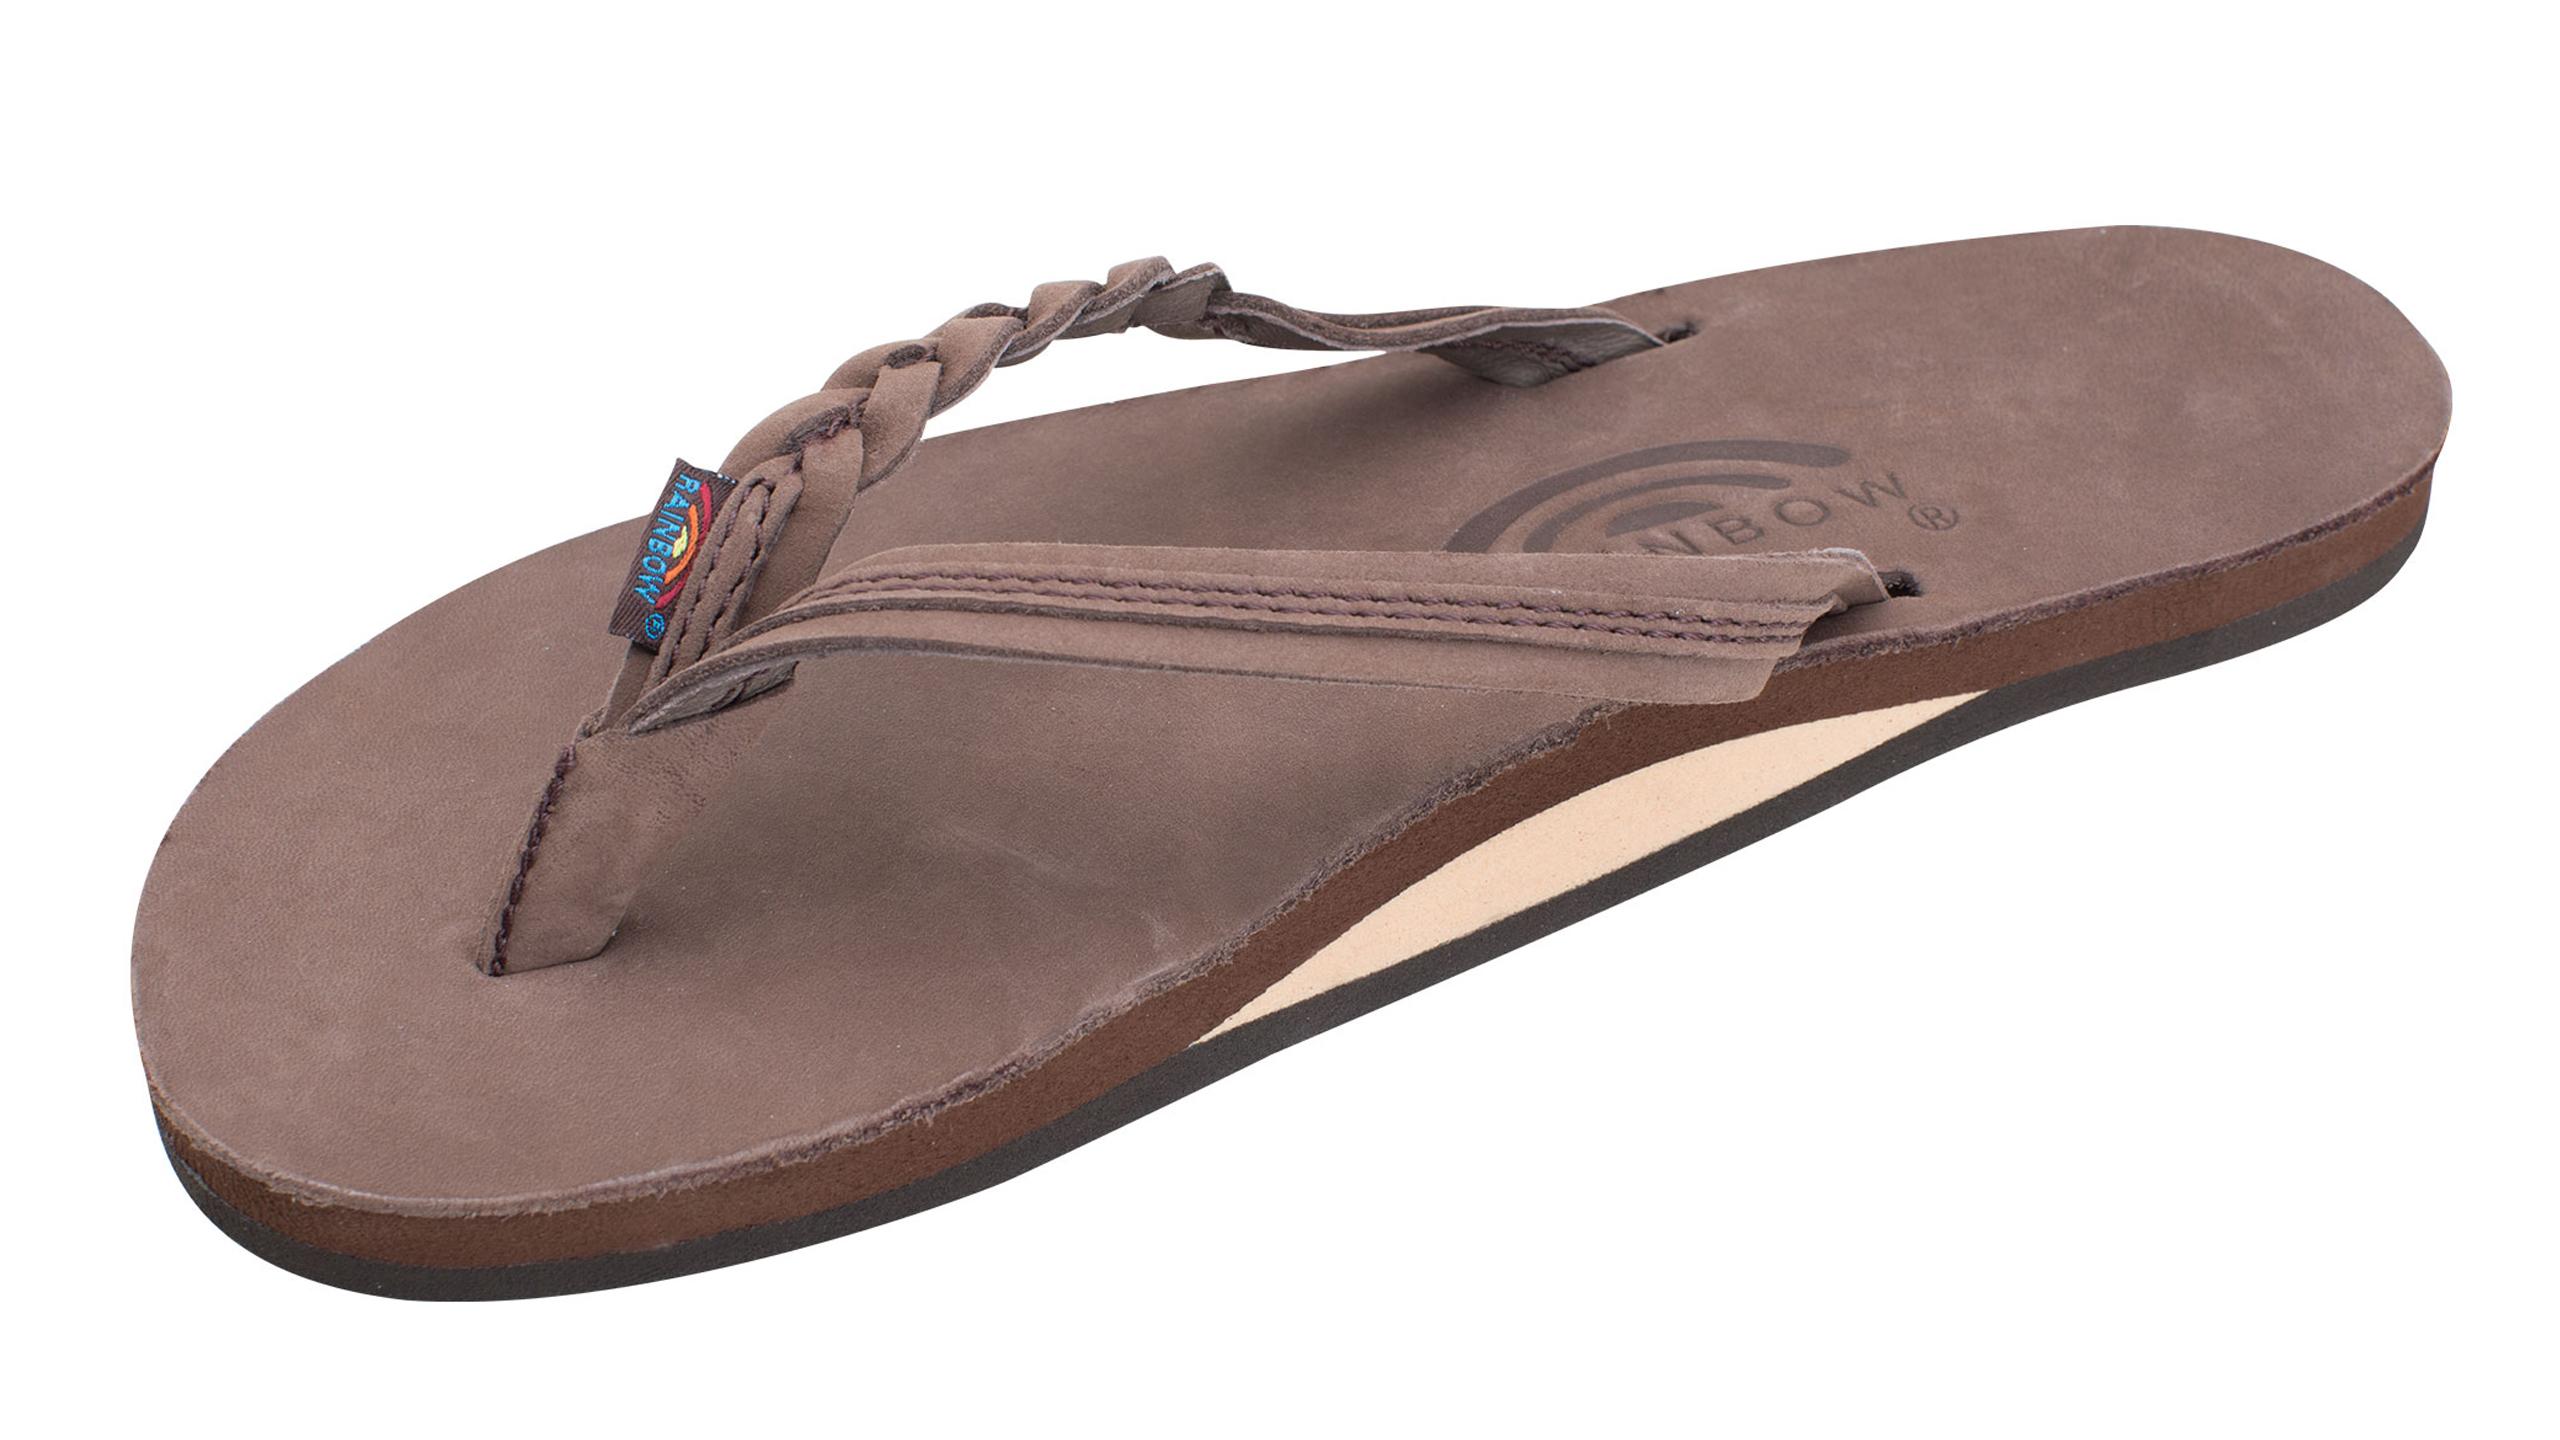 301ALTSB - Rainbow Sandals